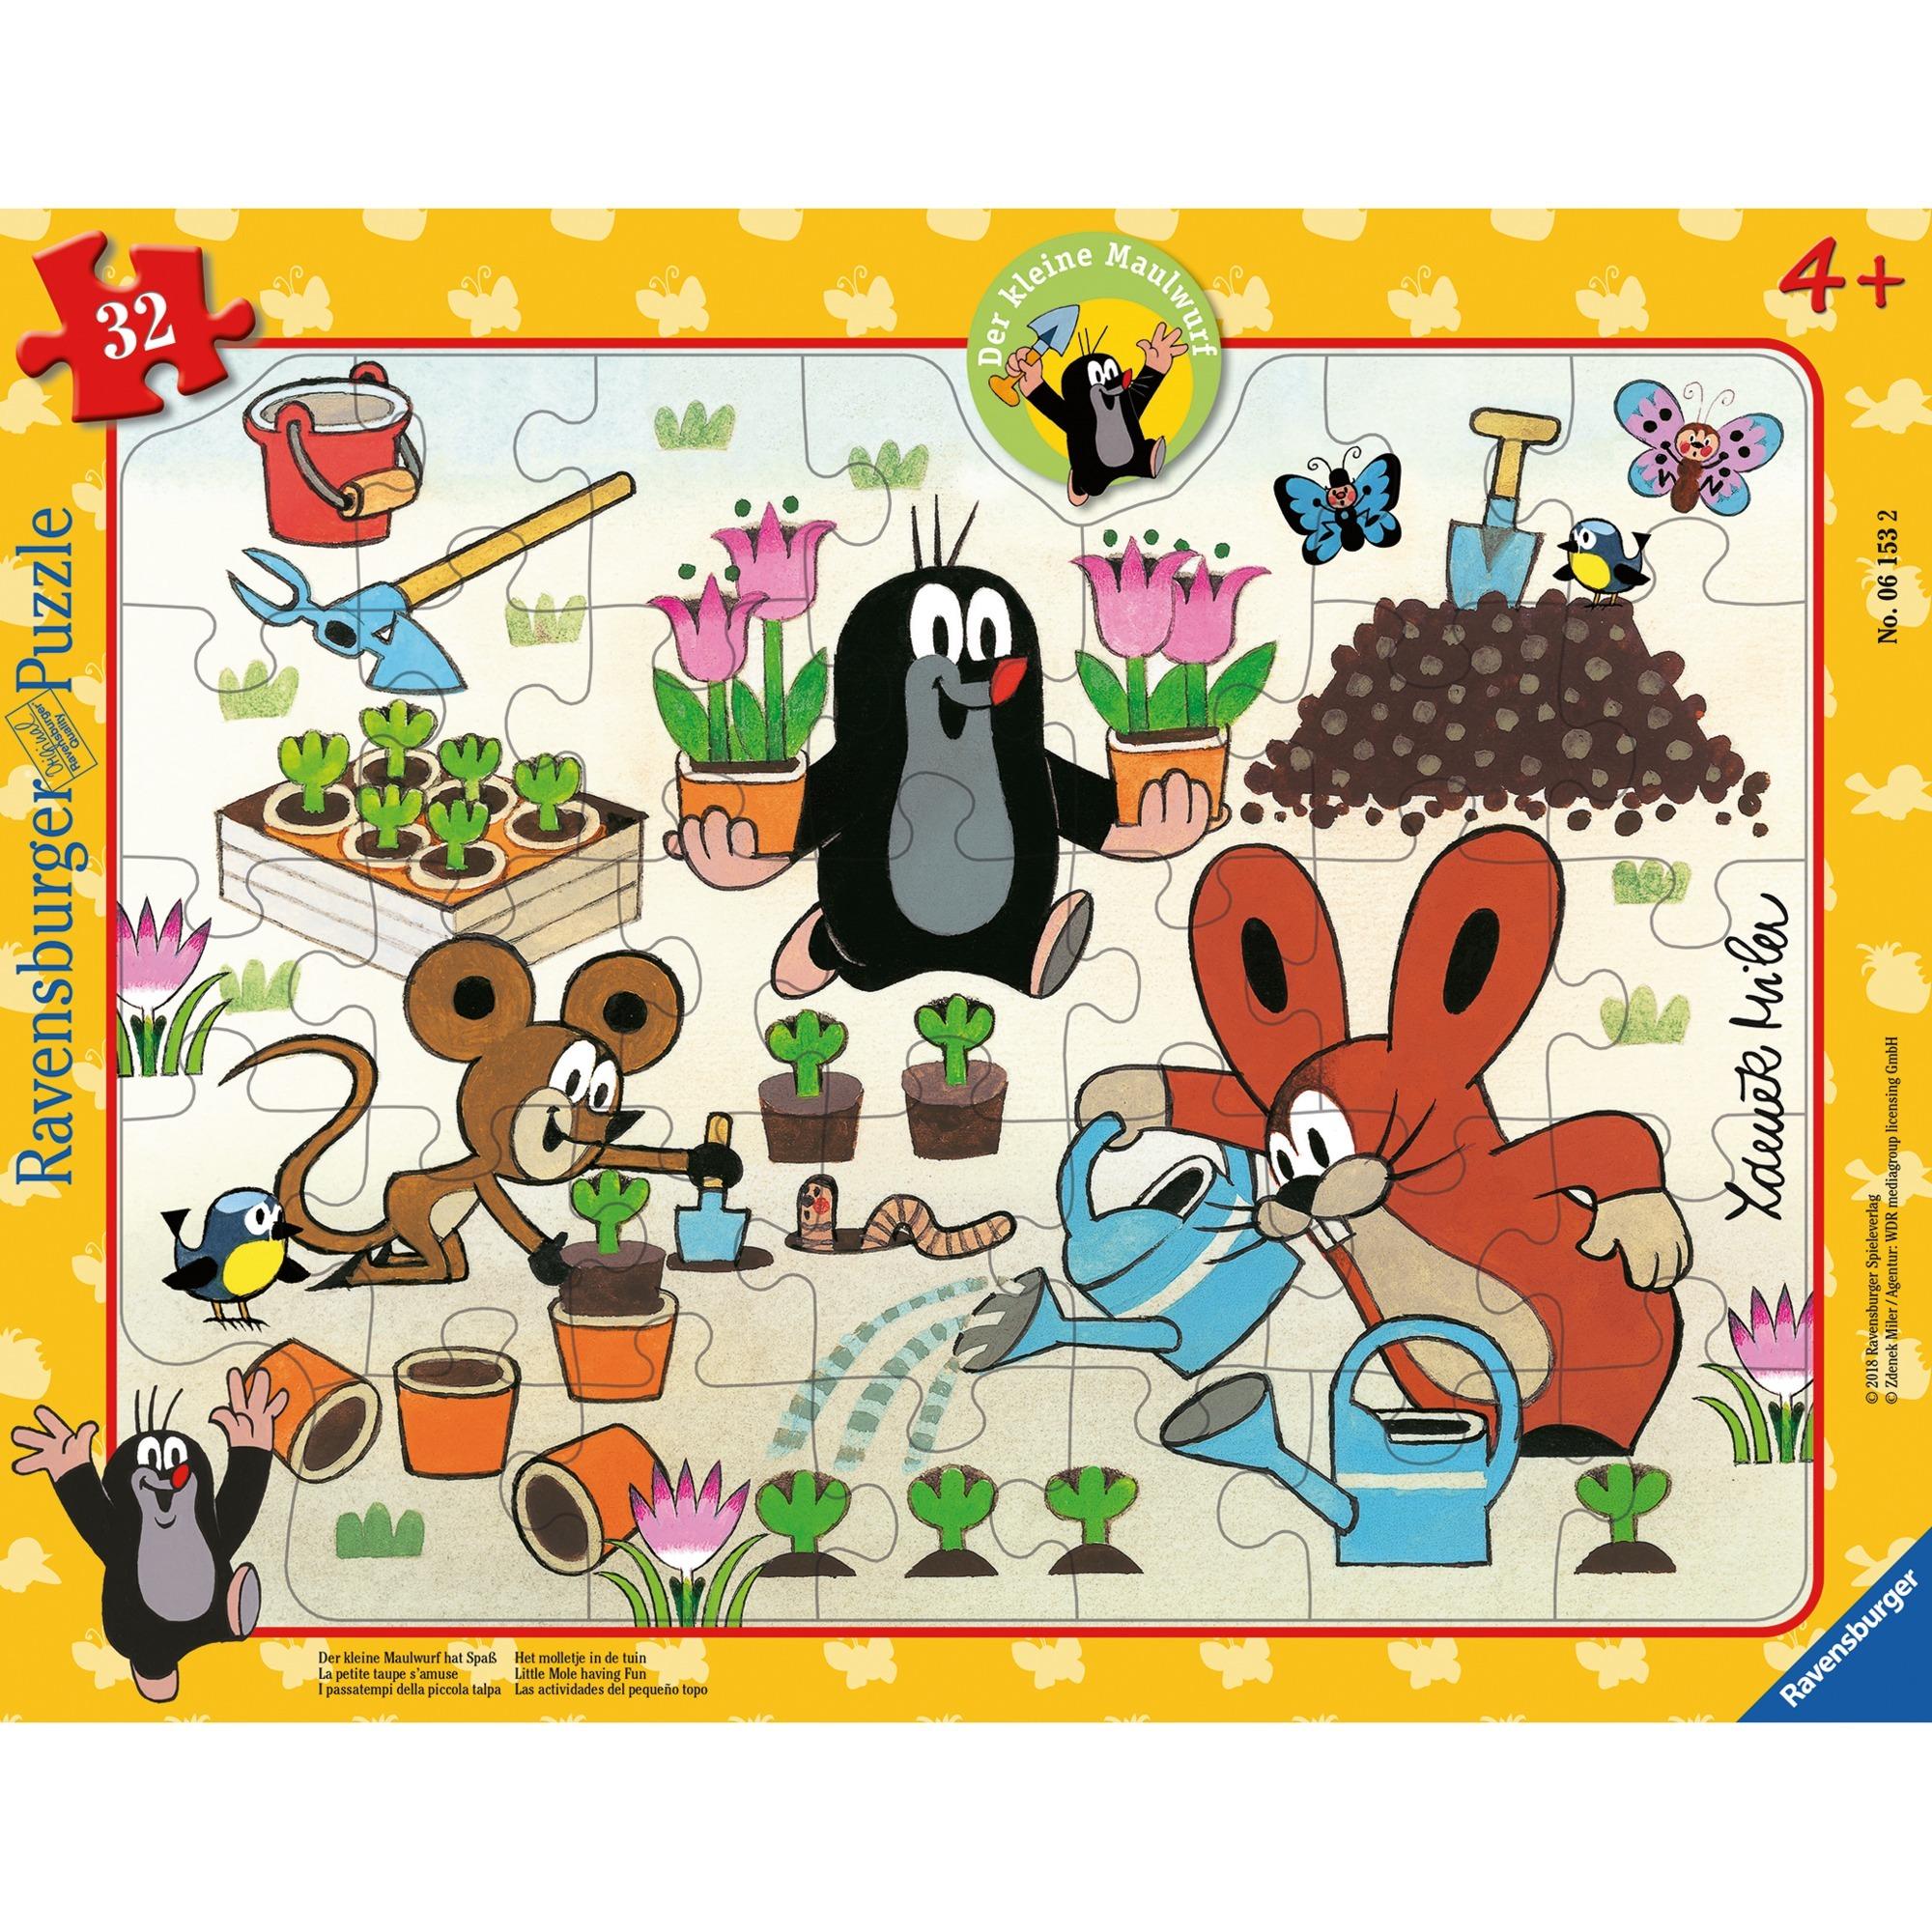 00.006.153 32pieza(s) puzzle